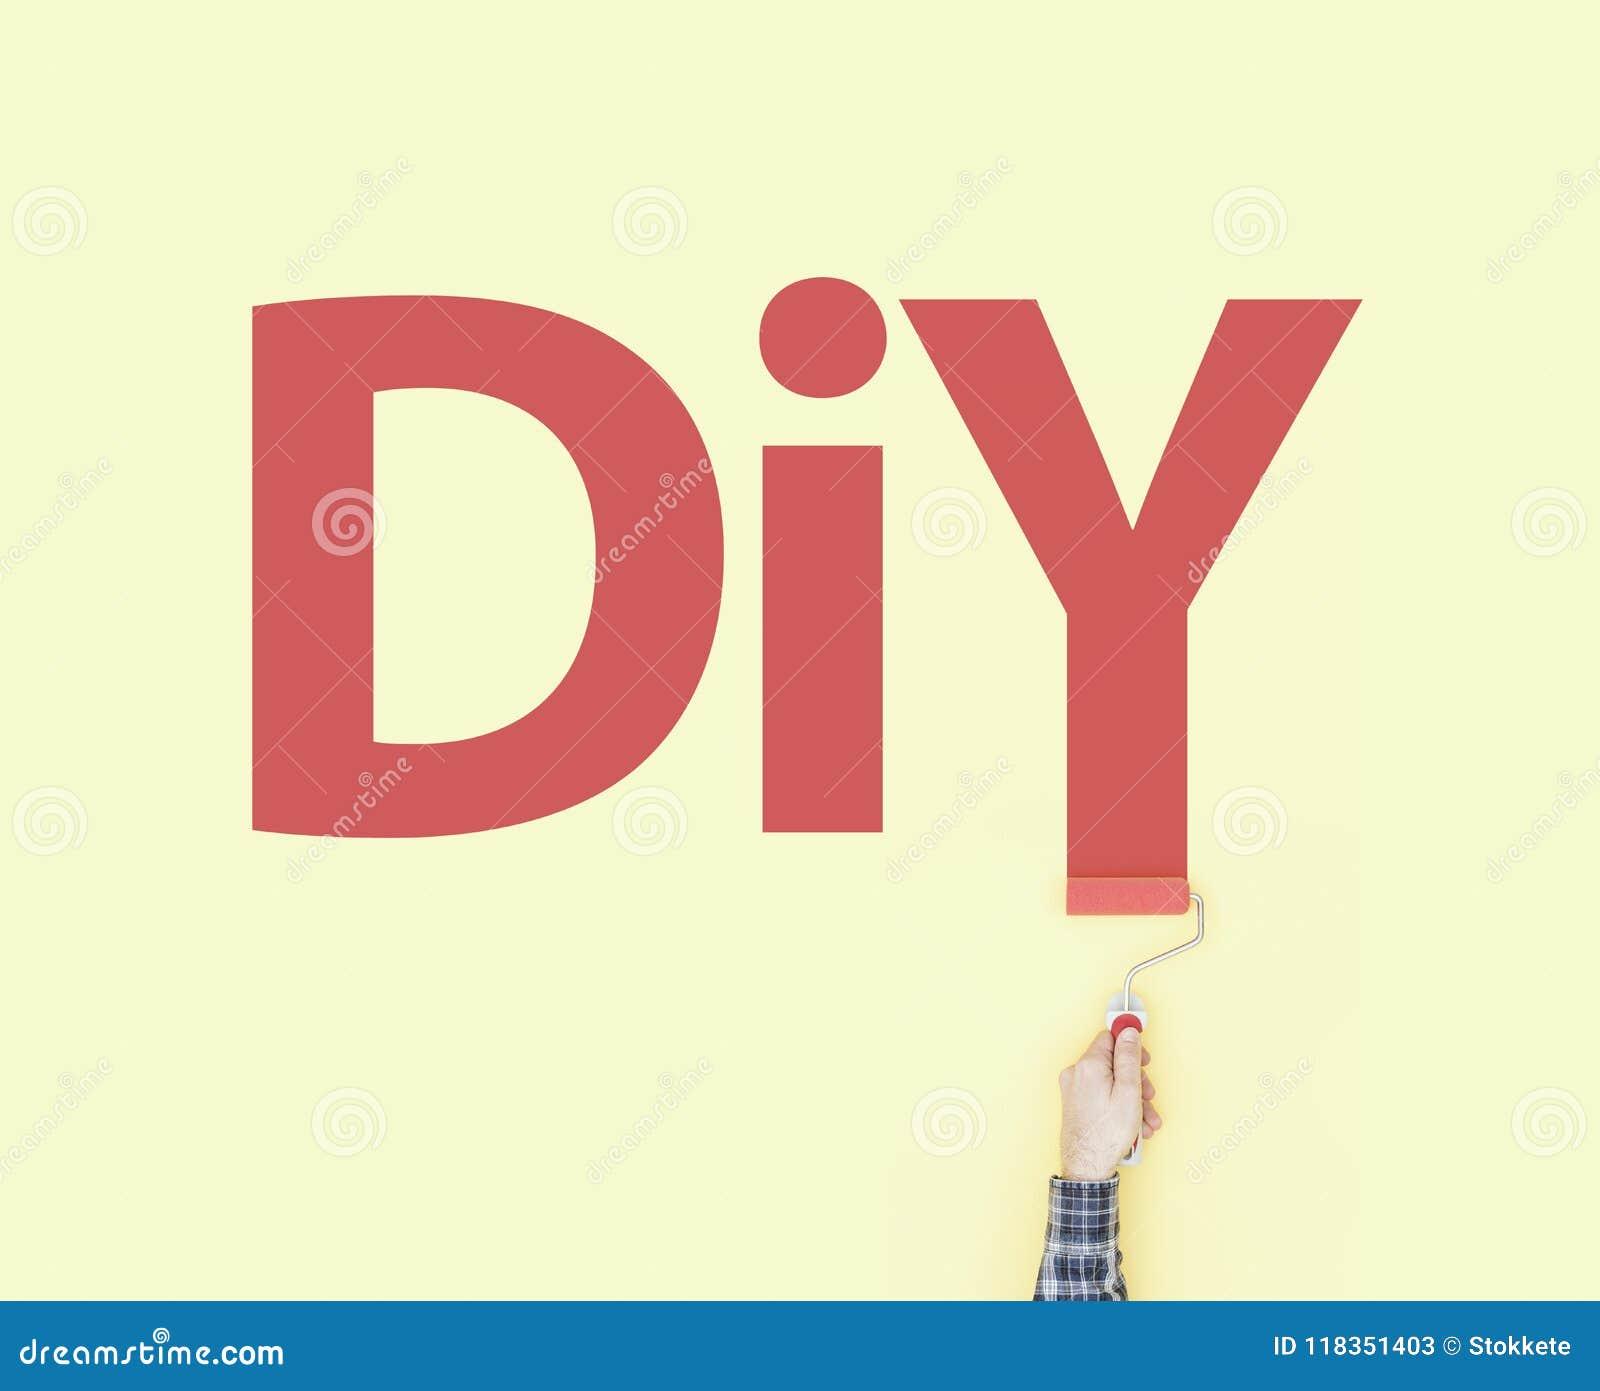 Decorator Painting DIY On A Wall Stock Image - Image of handyman ...